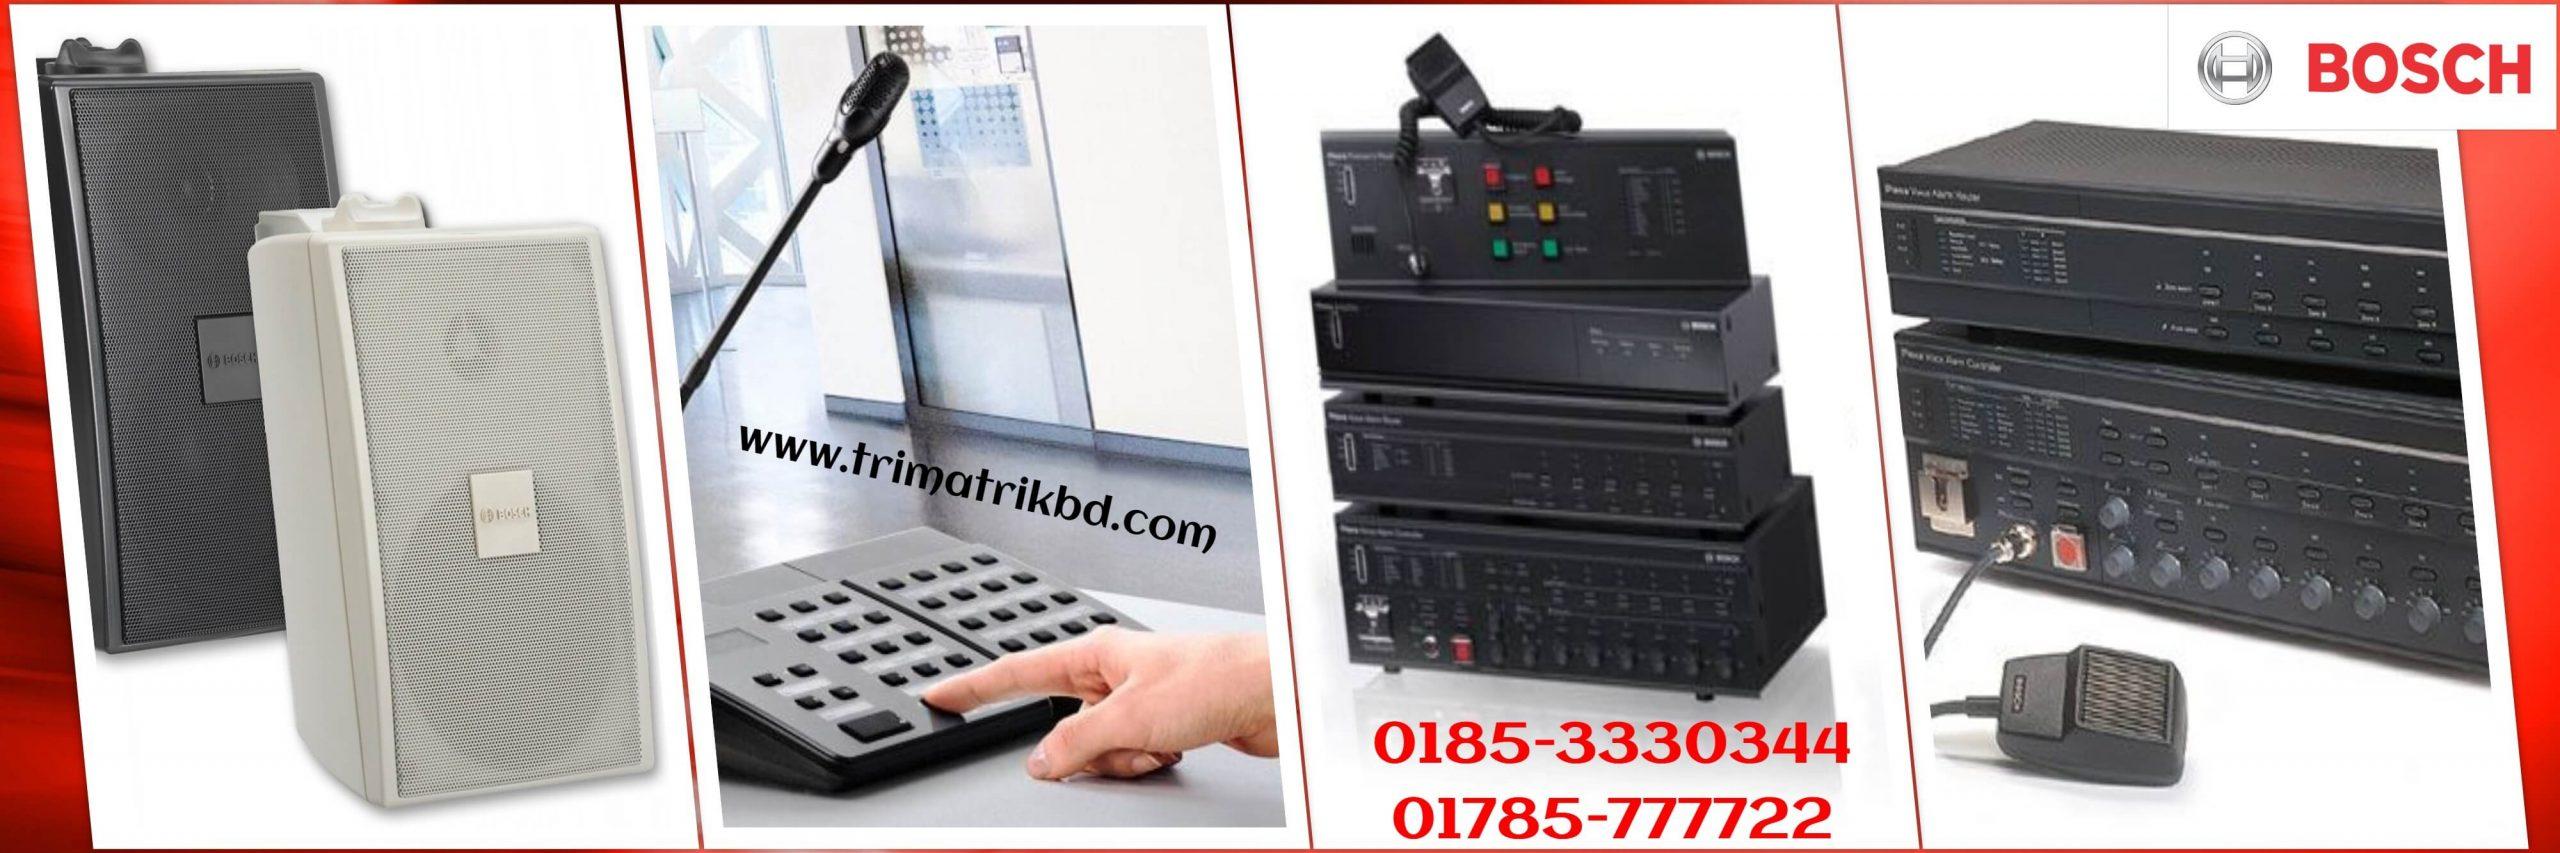 Bosch PA System Bangladesh